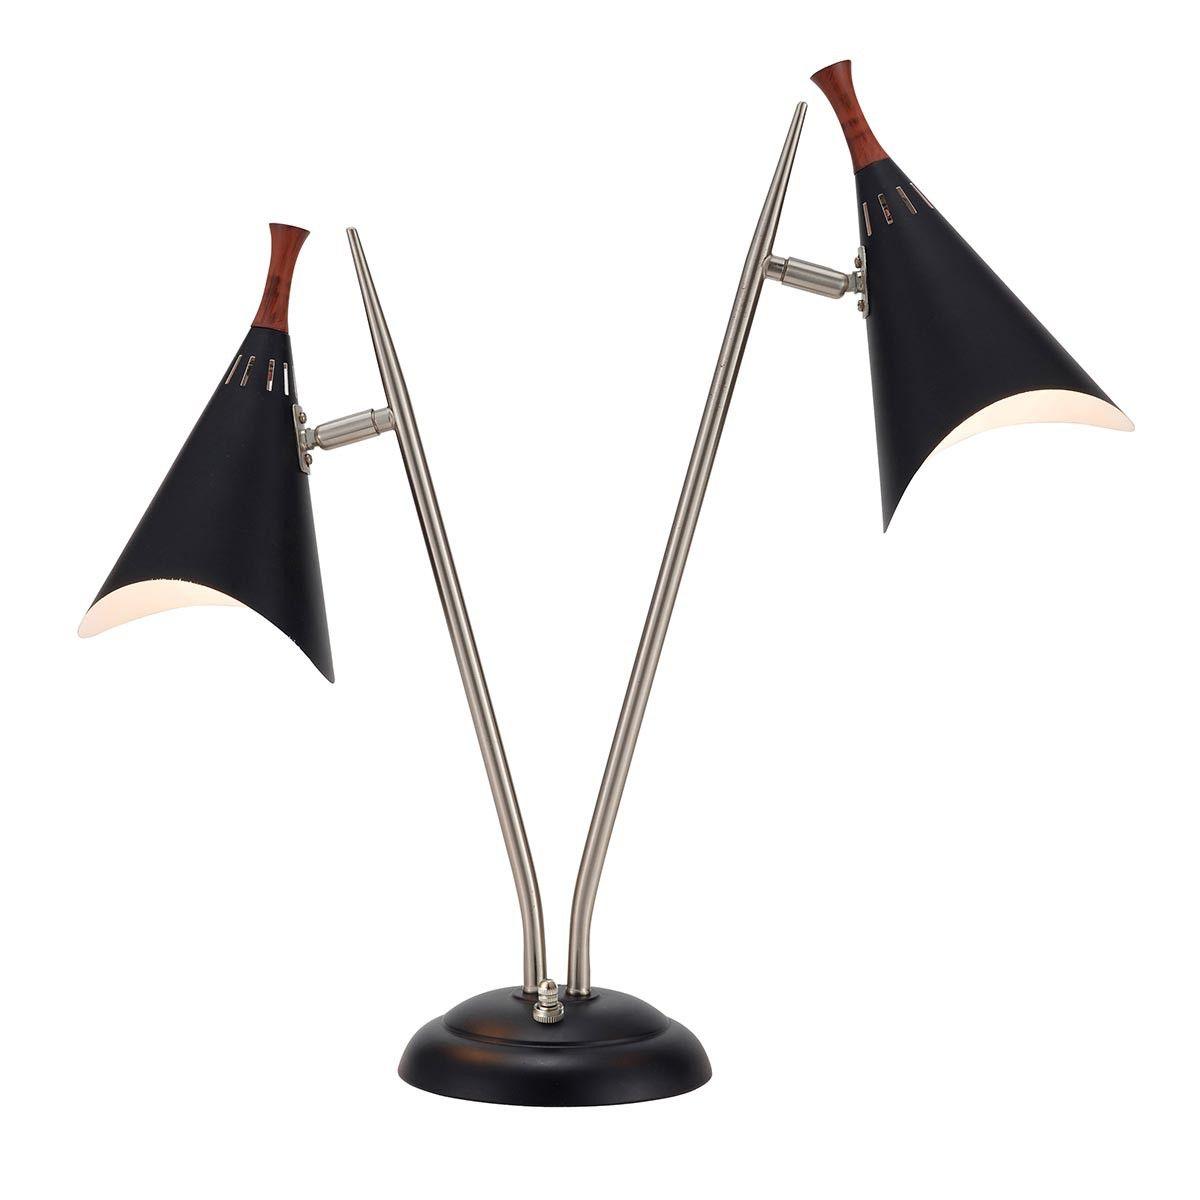 Fab Com Draper Desk Lamp Desk Lamp Black Desk Lamps